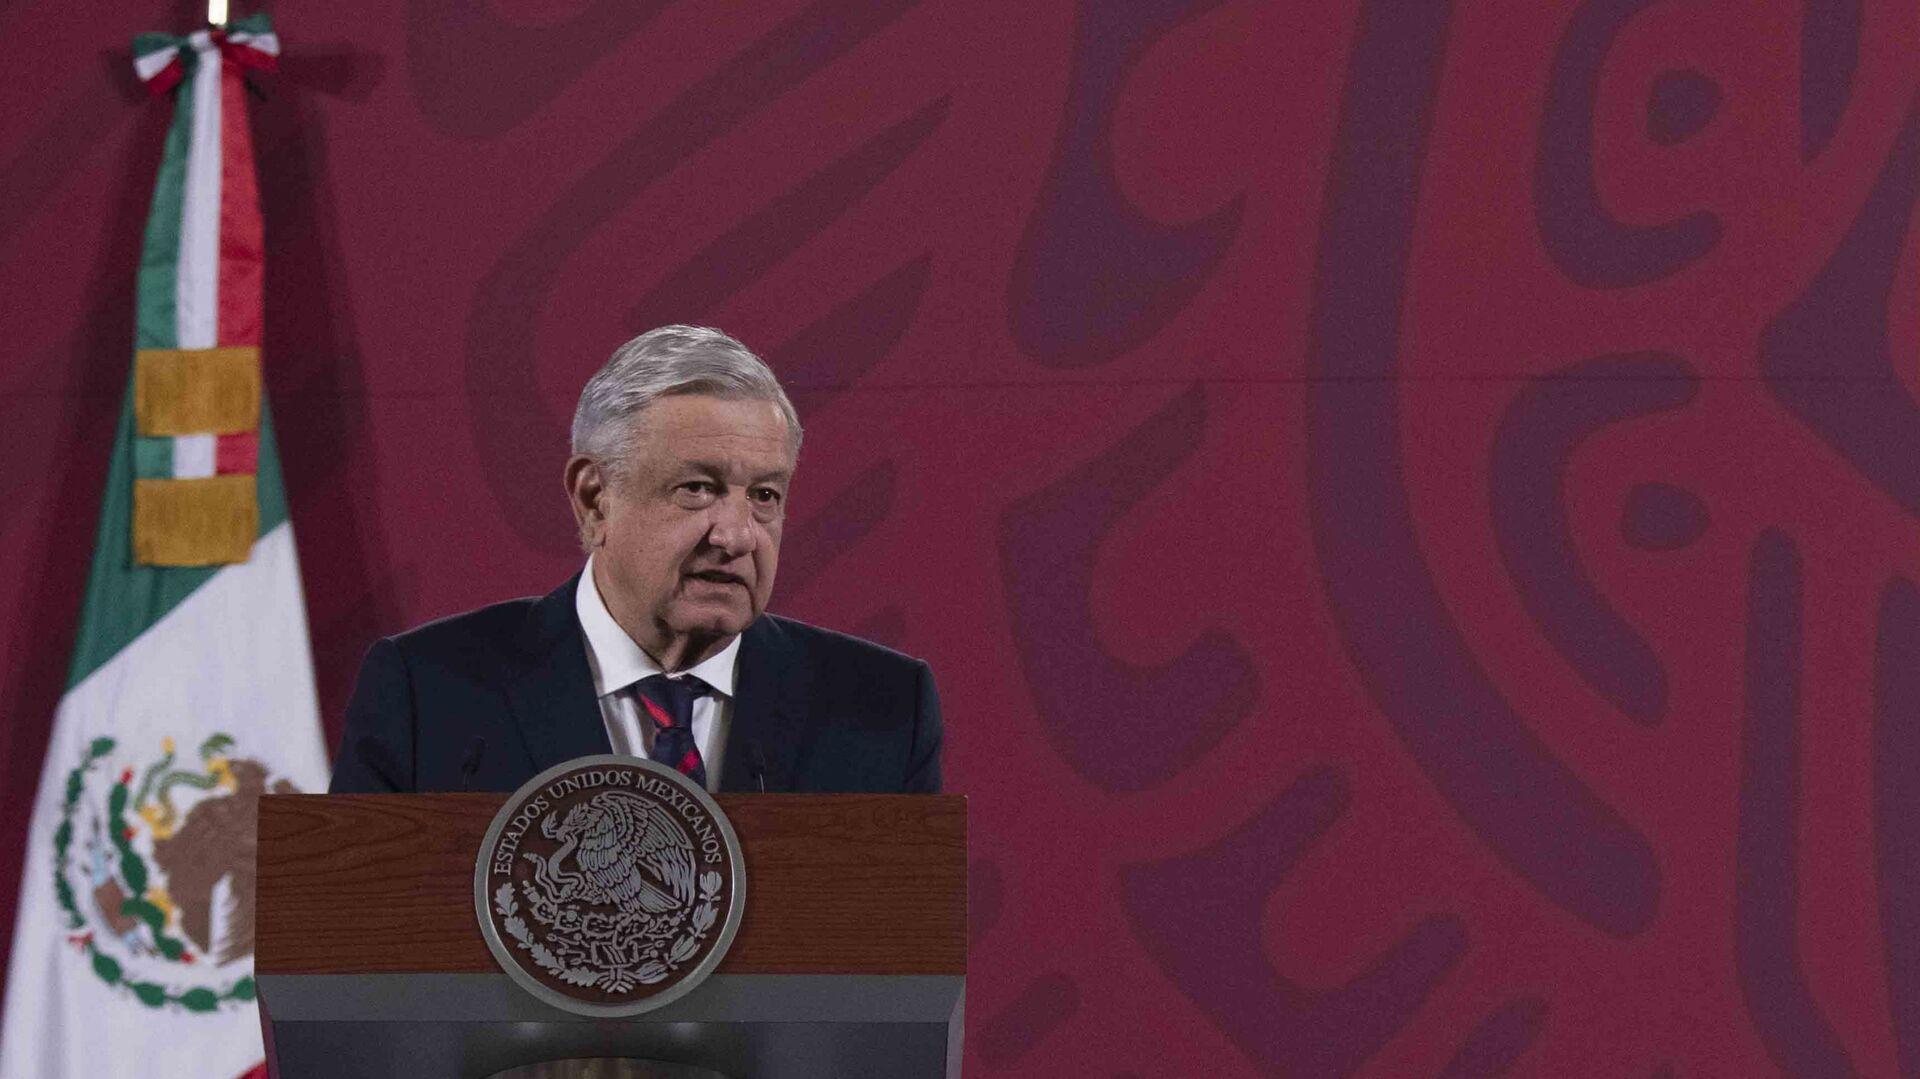 El presidente de México, Andrés Manuel López Obrador - Sputnik Mundo, 1920, 05.03.2021